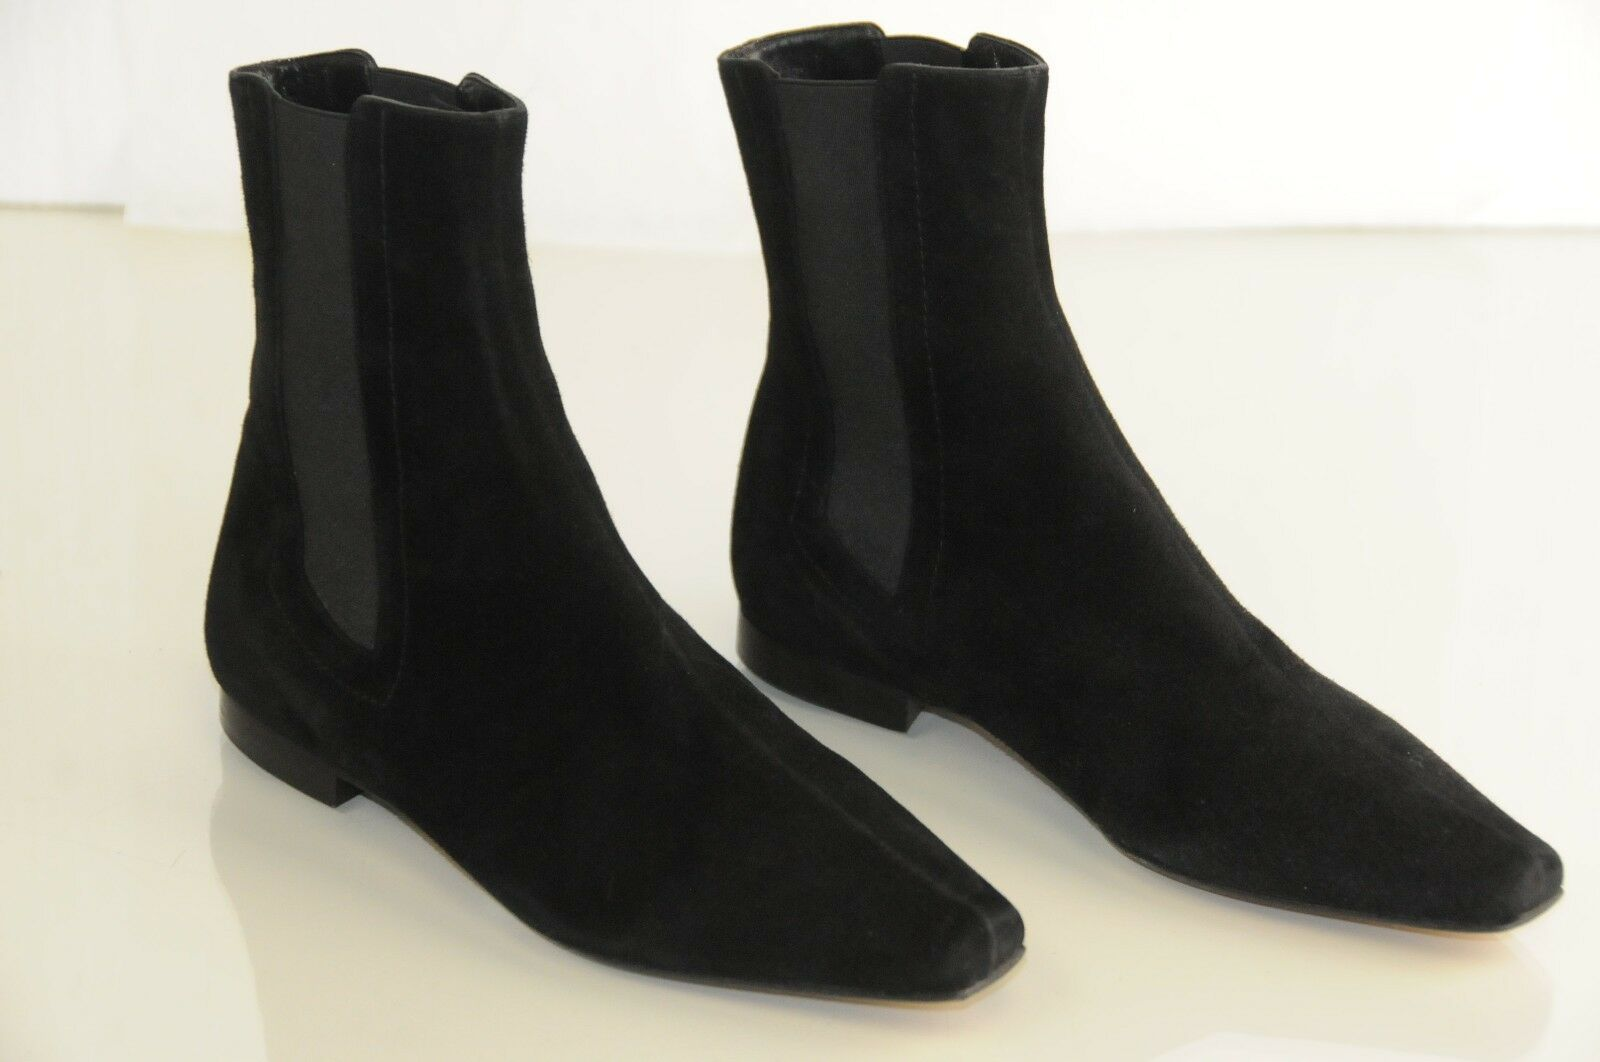 NEW MANOLO BLAHNIK Flat Ankle Stiefel schwarz Suede Flats Stiefelies schuhe 35.5